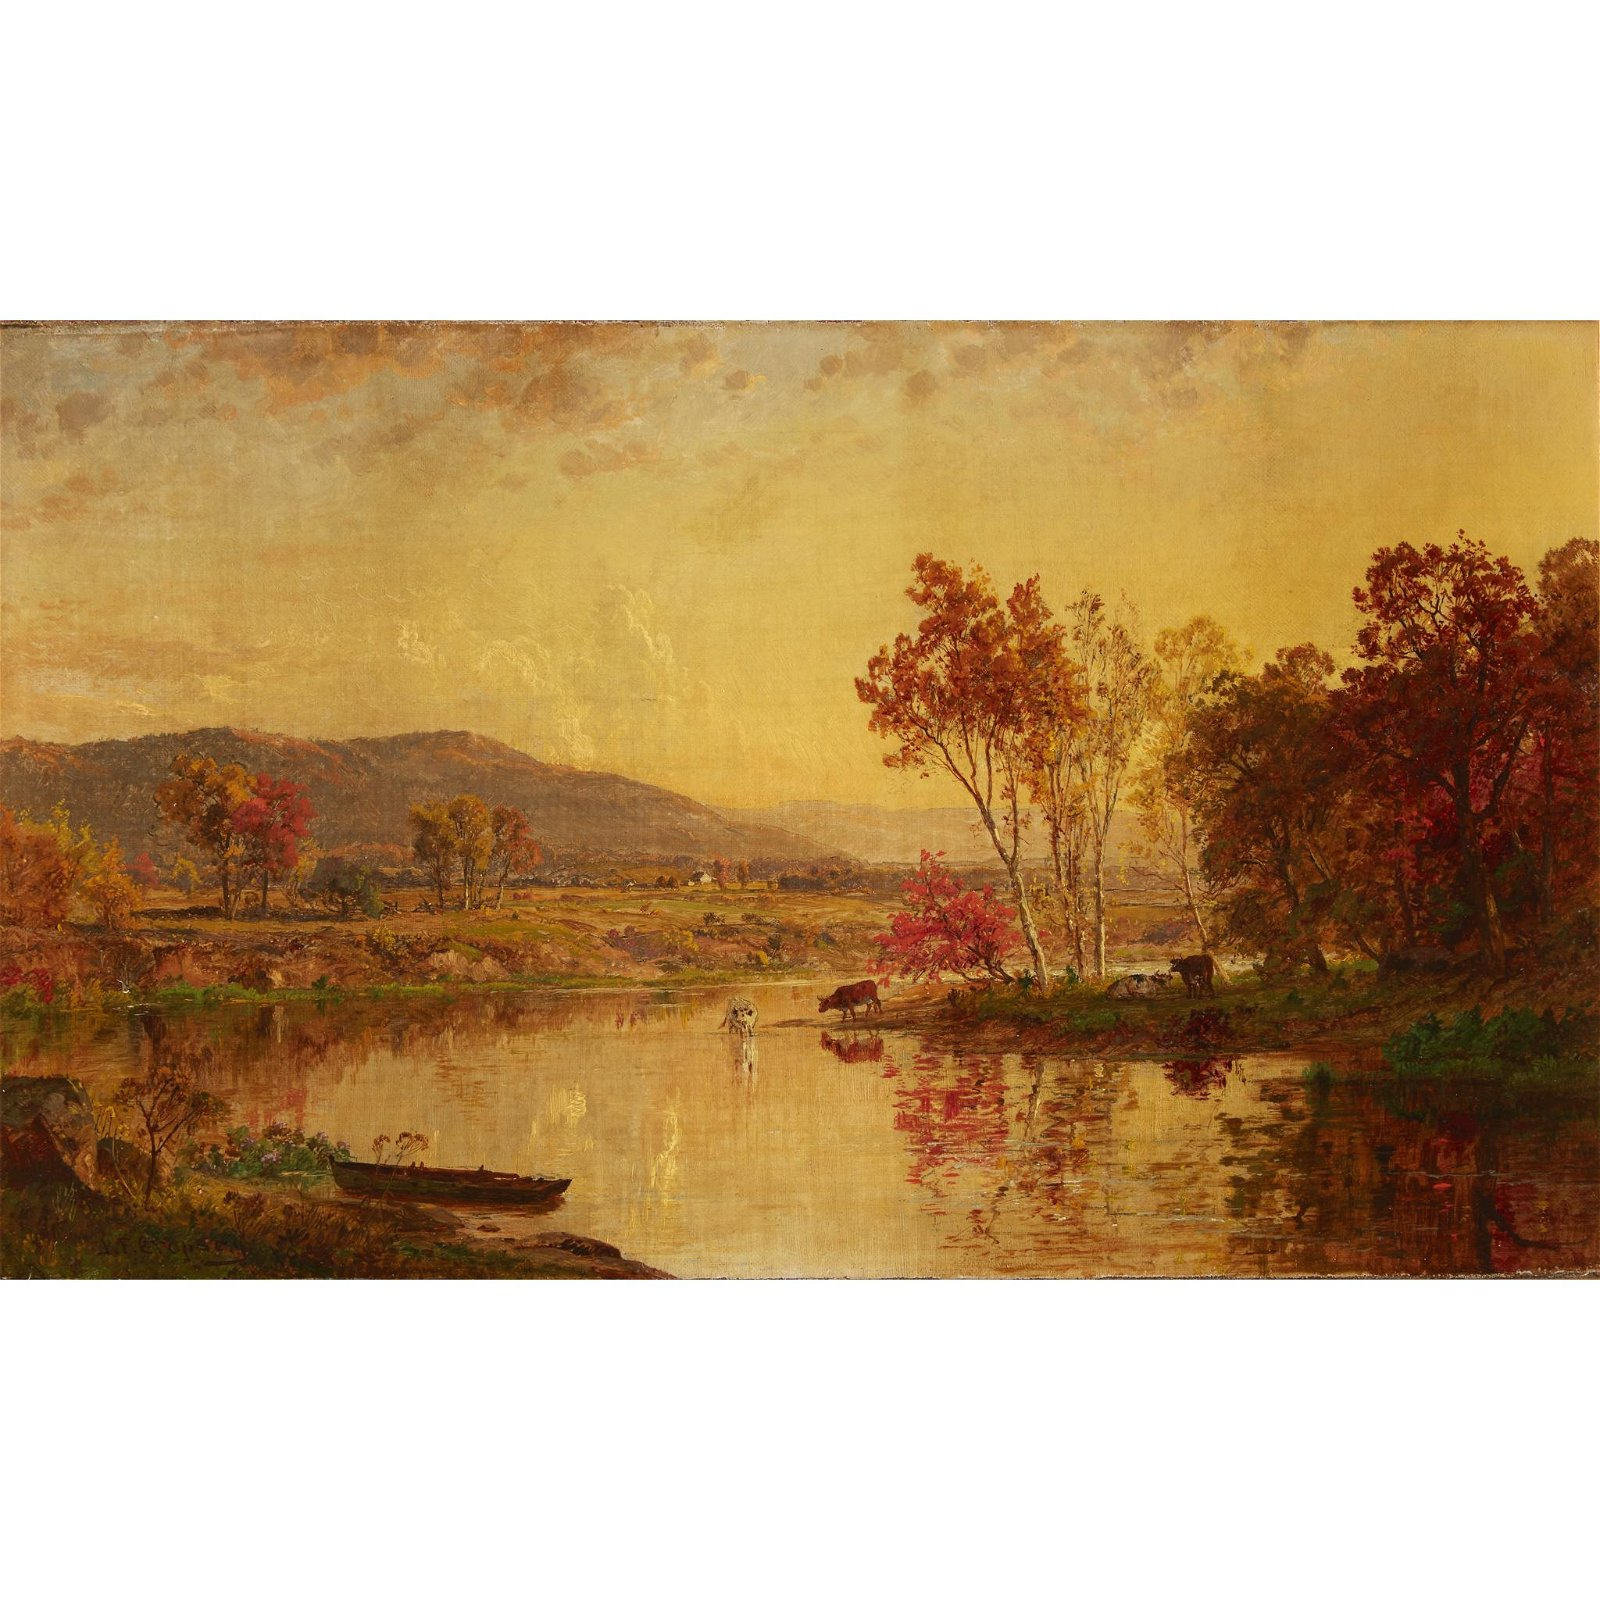 Jasper Francis Cropsey (American, 1823-1900), , An